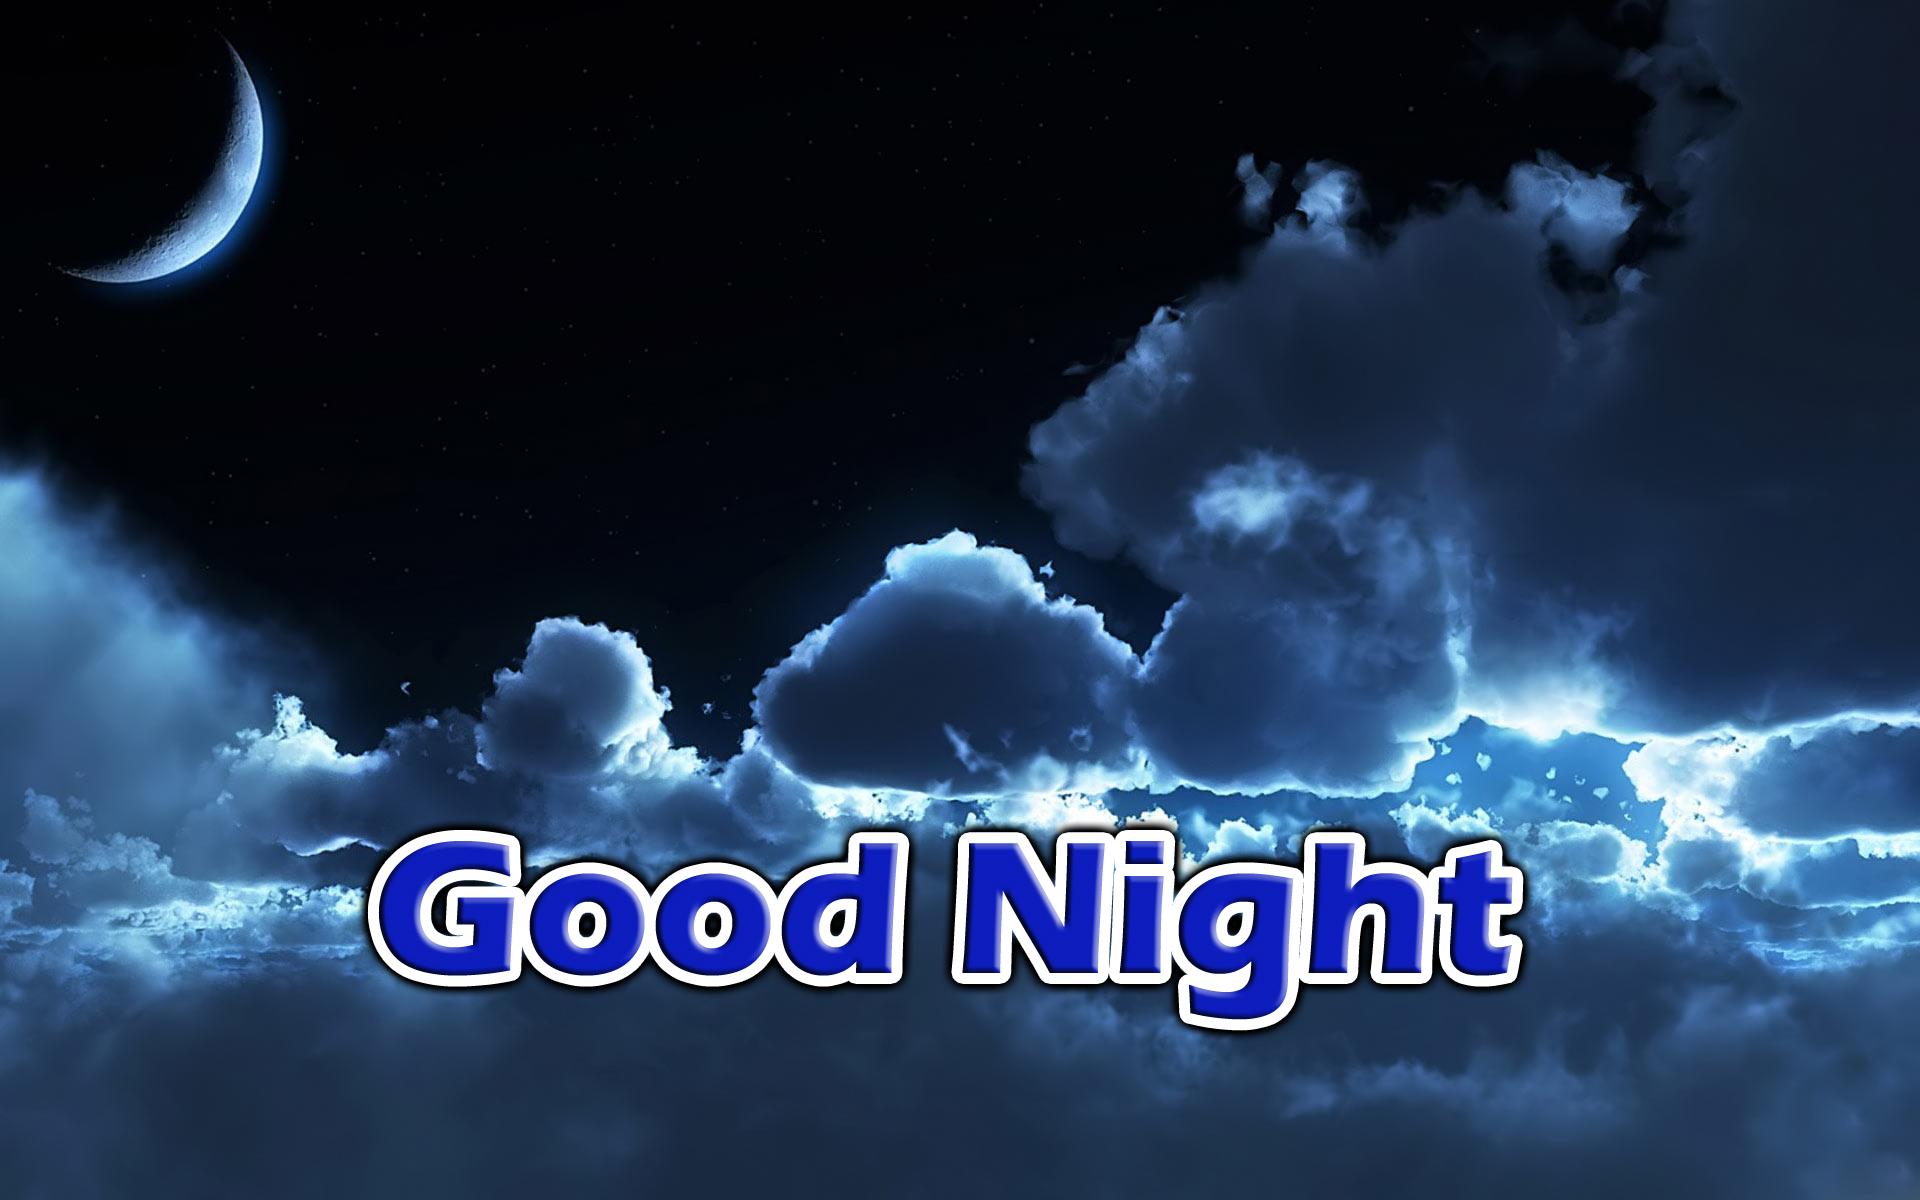 Good night image hd full size